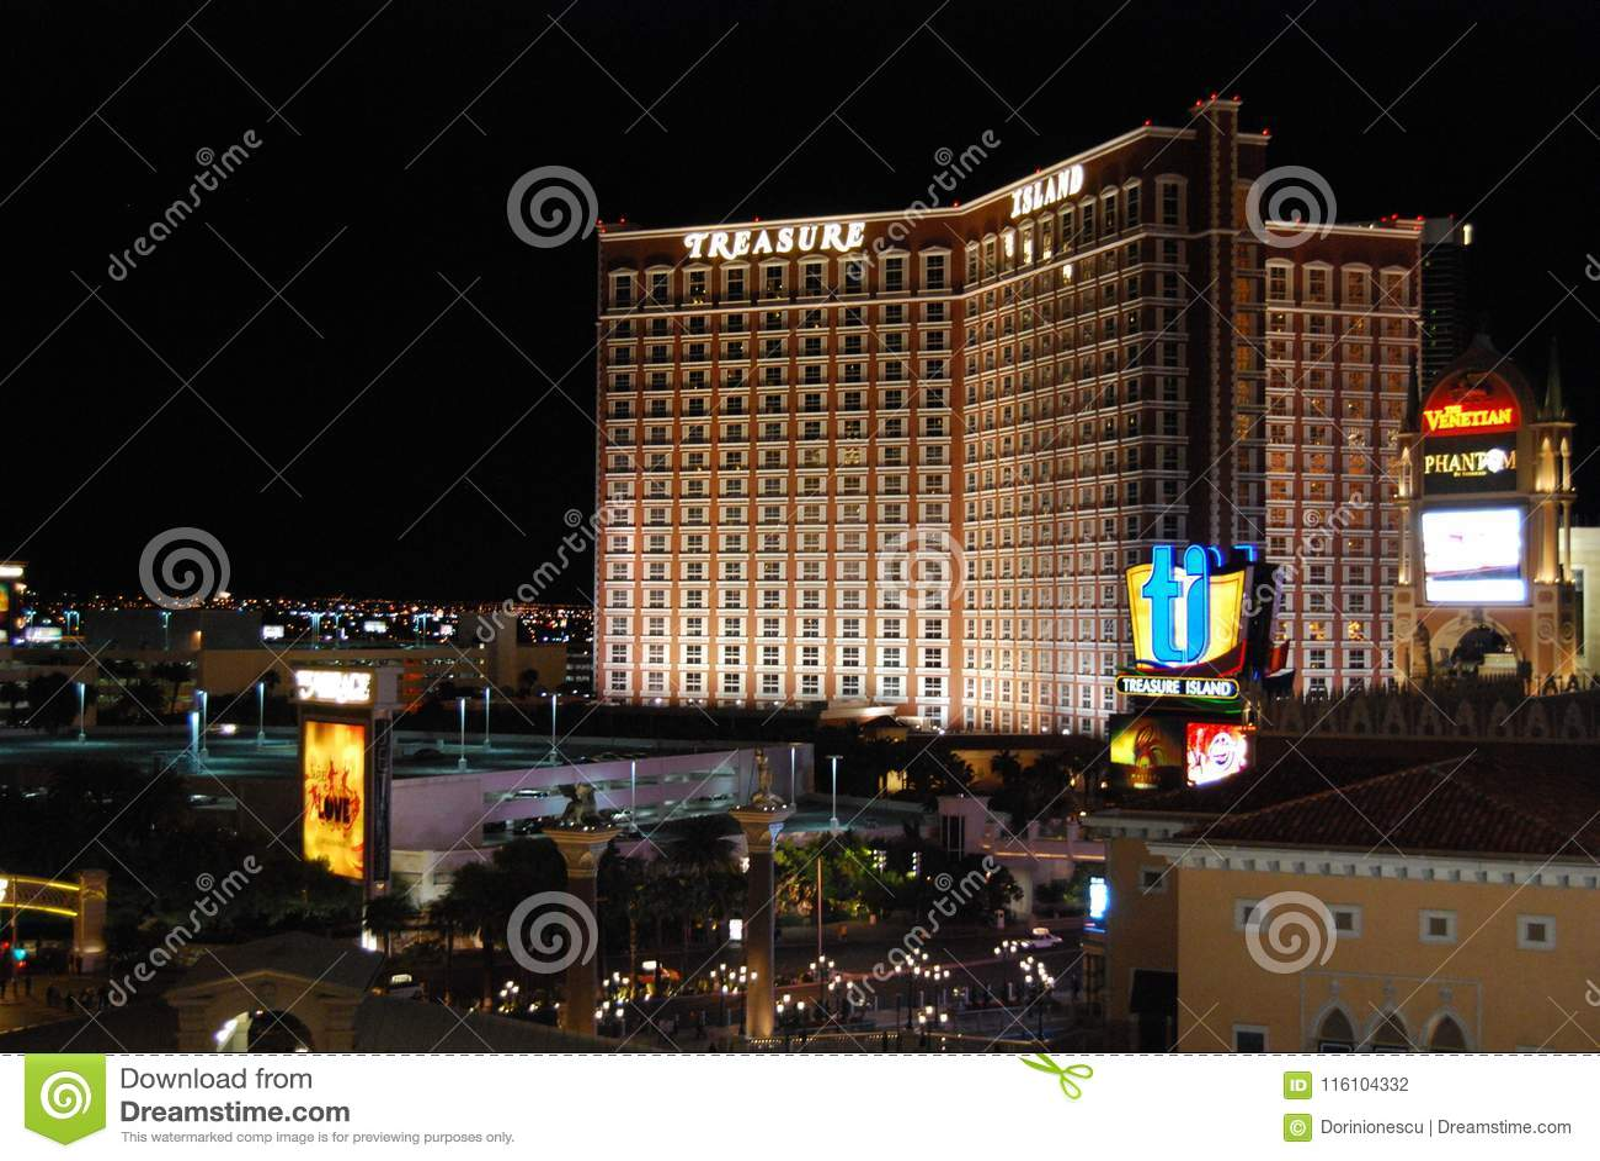 Международный аэропорт McCarran, прокладка Лас-Вегас, Лас-Вегас, Palazzo, район метрополитена, ноча, город, метрополия